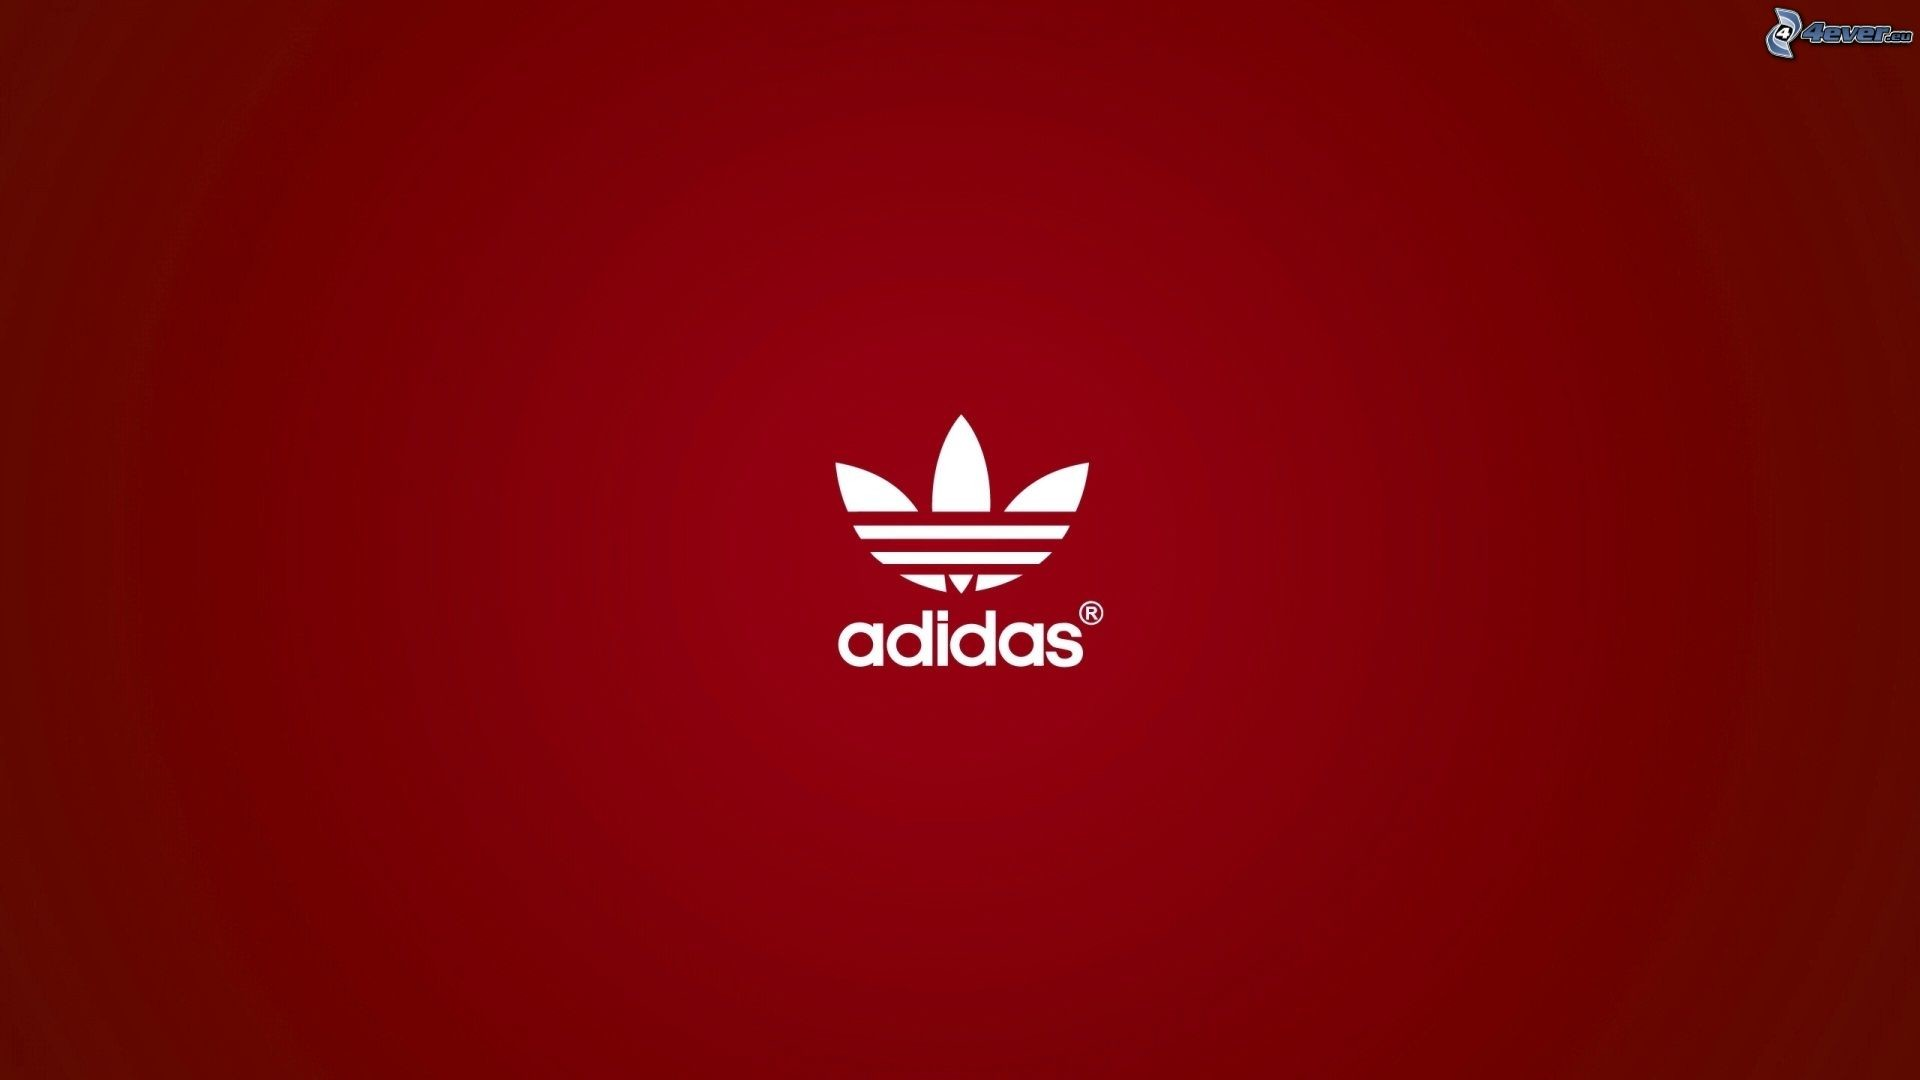 wallpaper logo adidas 77 images